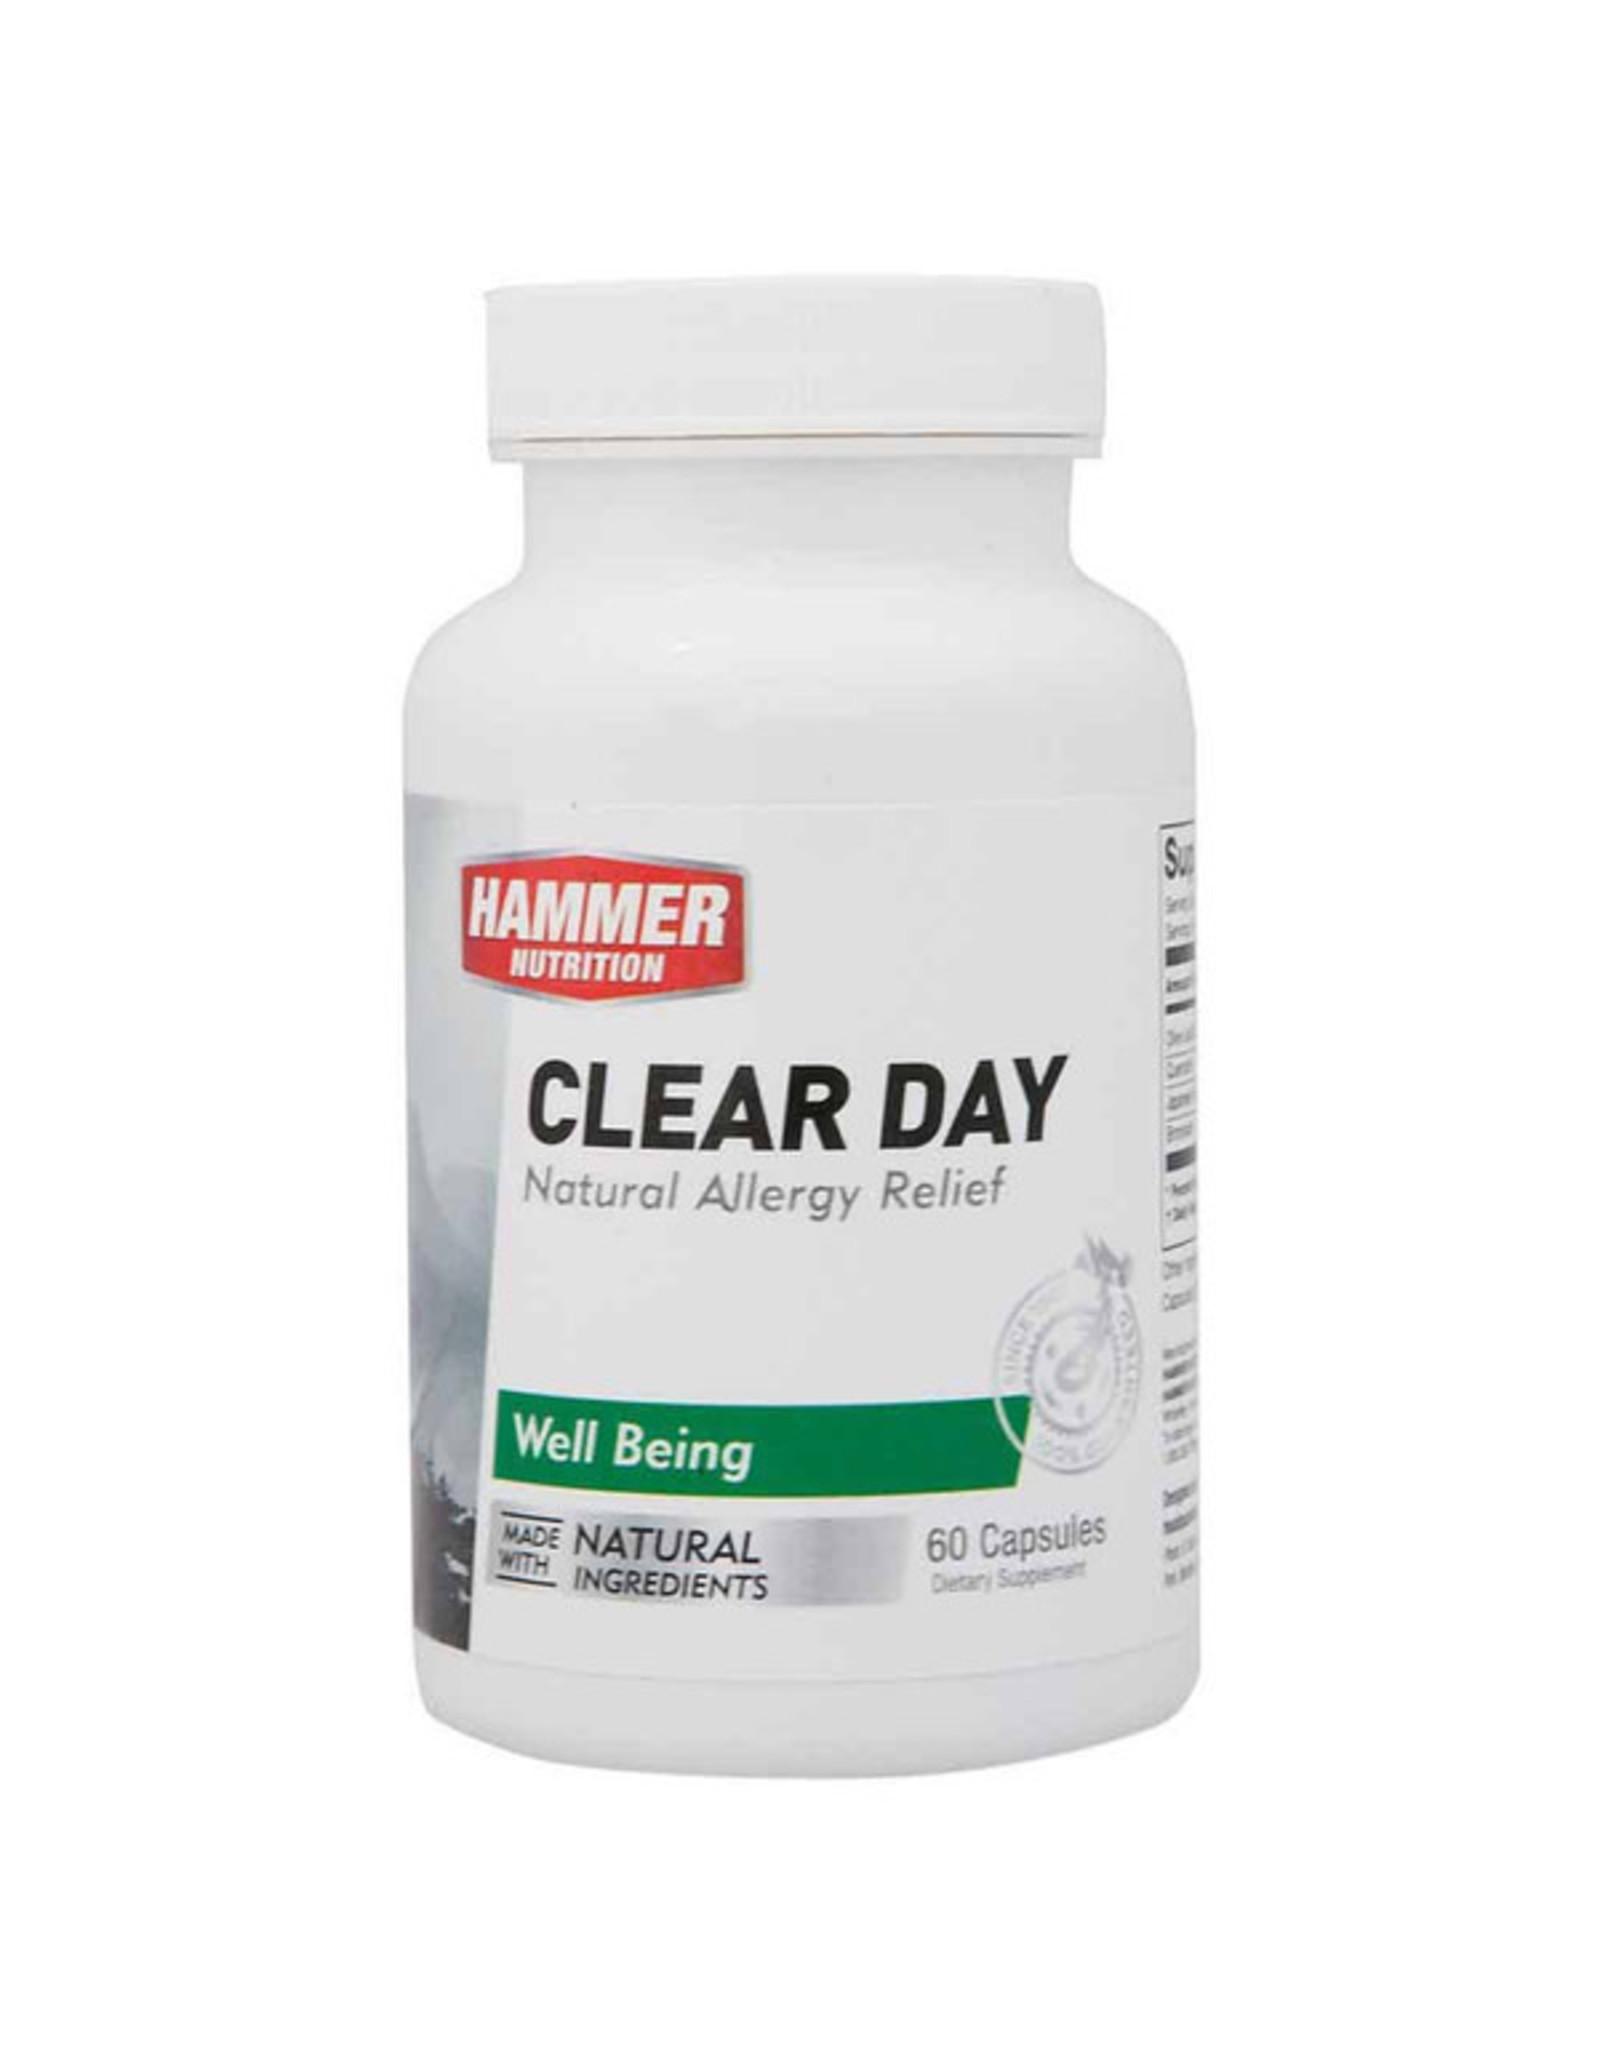 Hammer Nutrition Hammer Nutrition Clear Day Allergy